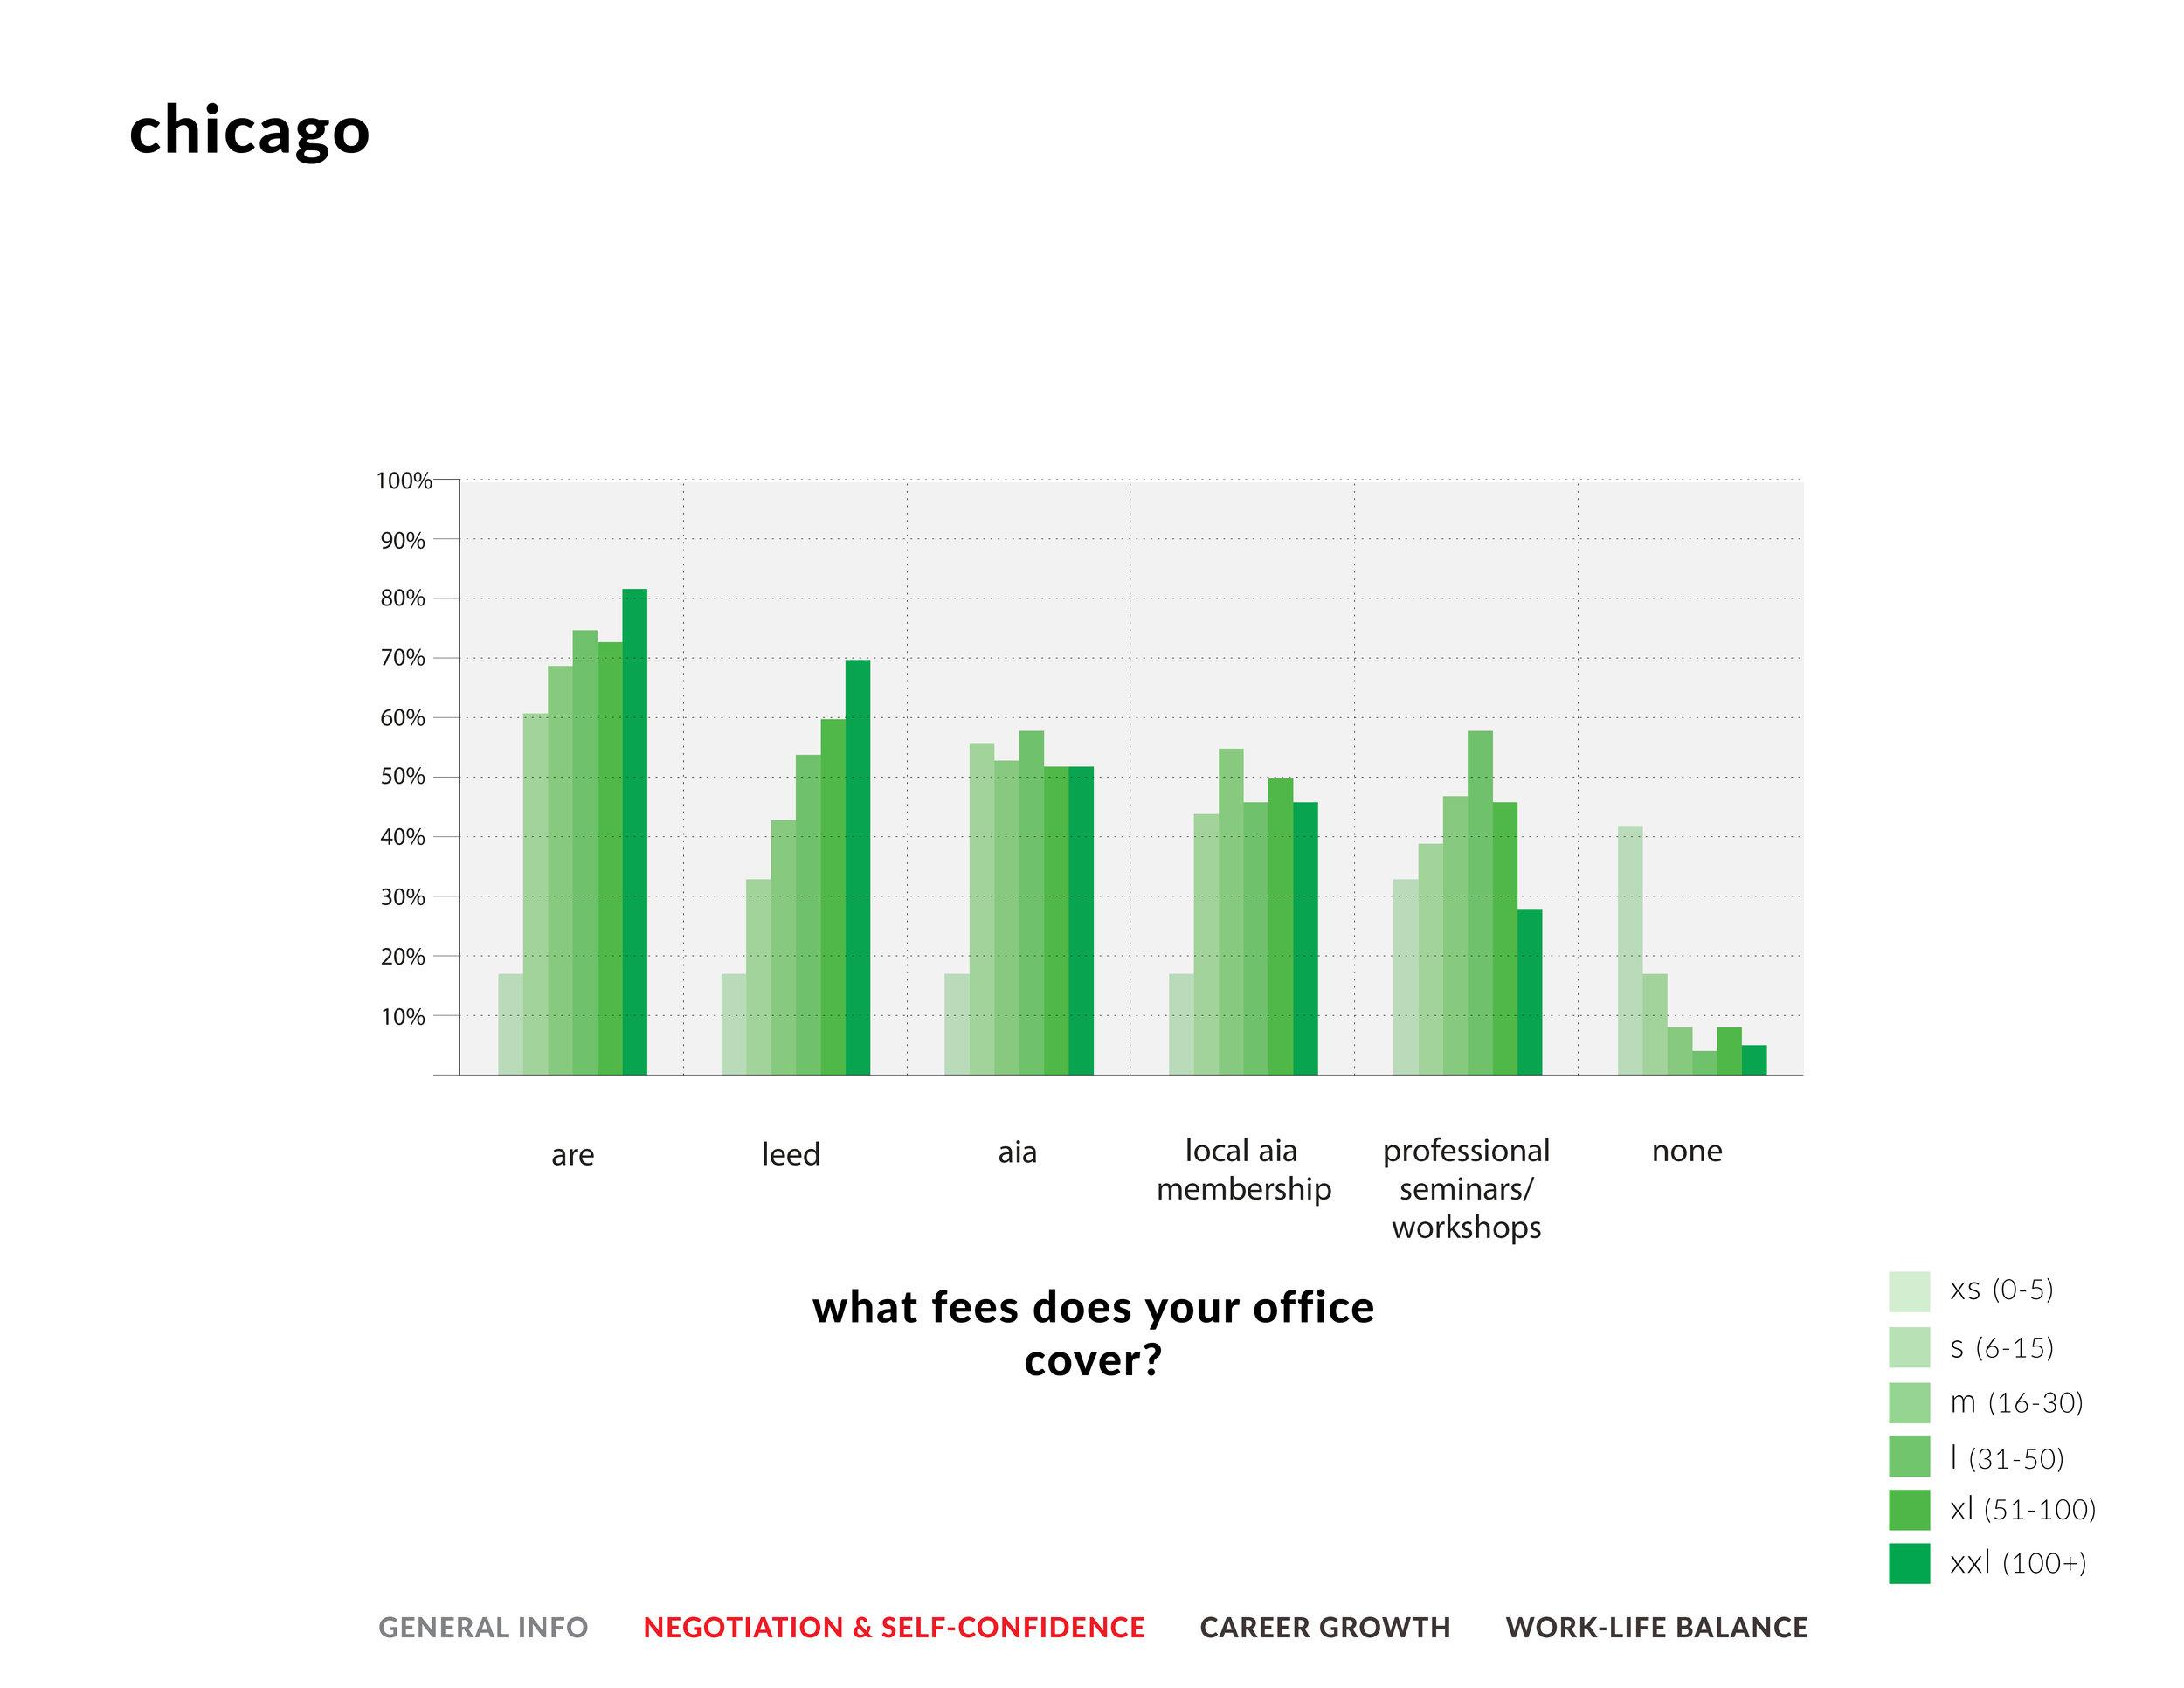 survey results99.jpg